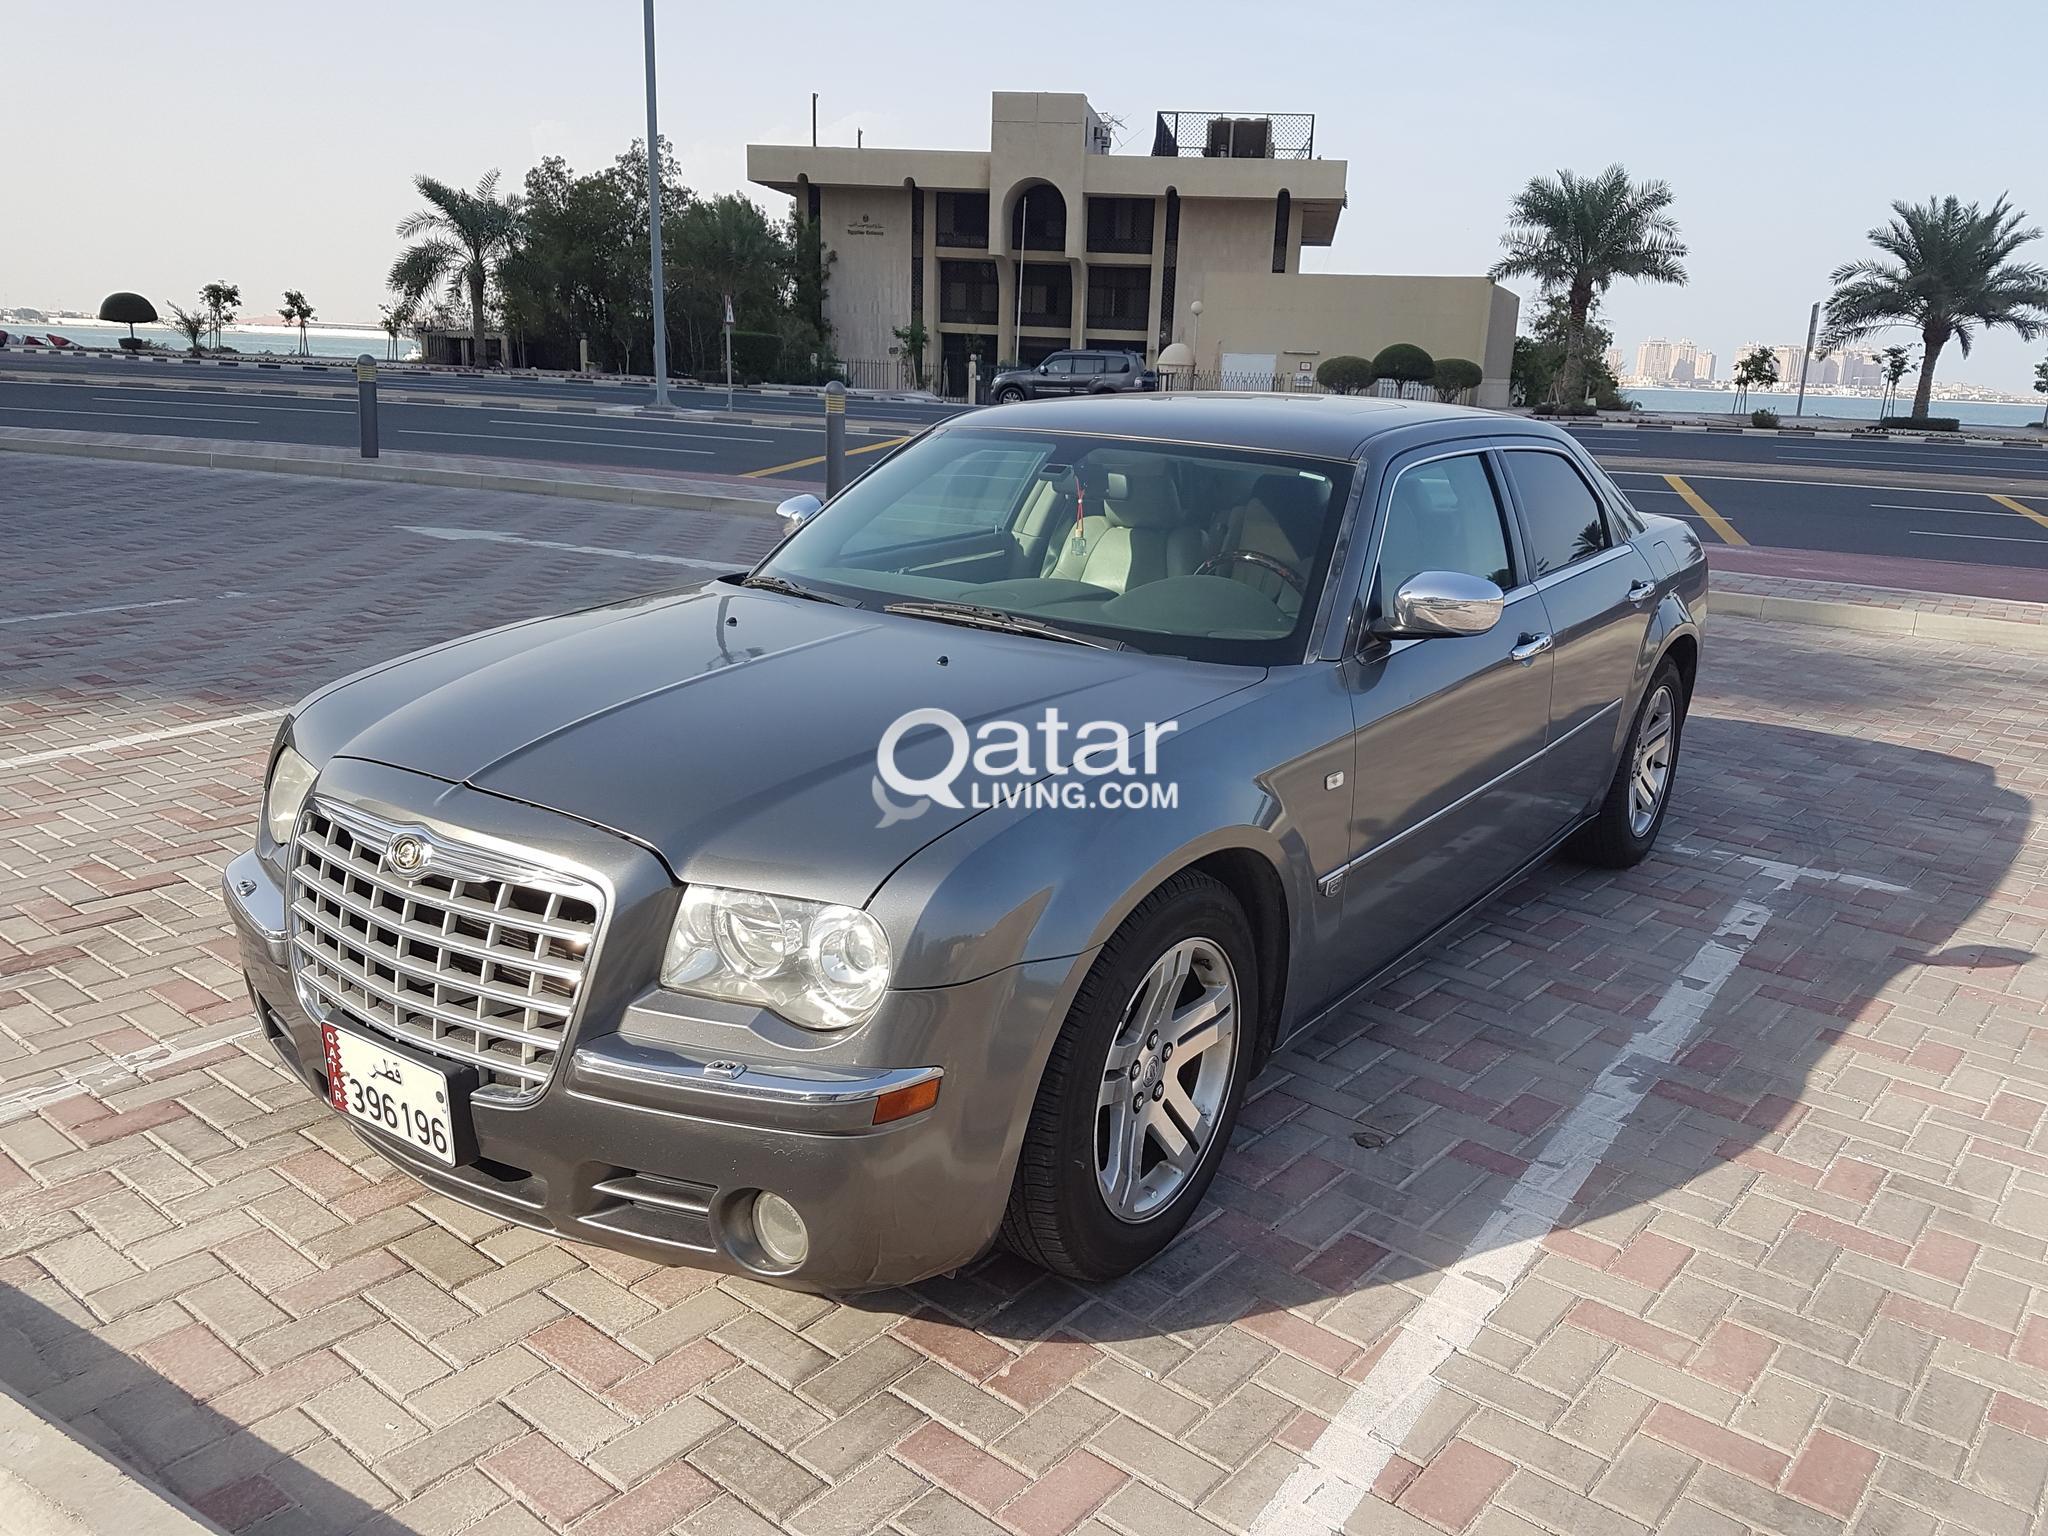 Chrysler 300C - V8 Hemi Engine 5 7 | Qatar Living